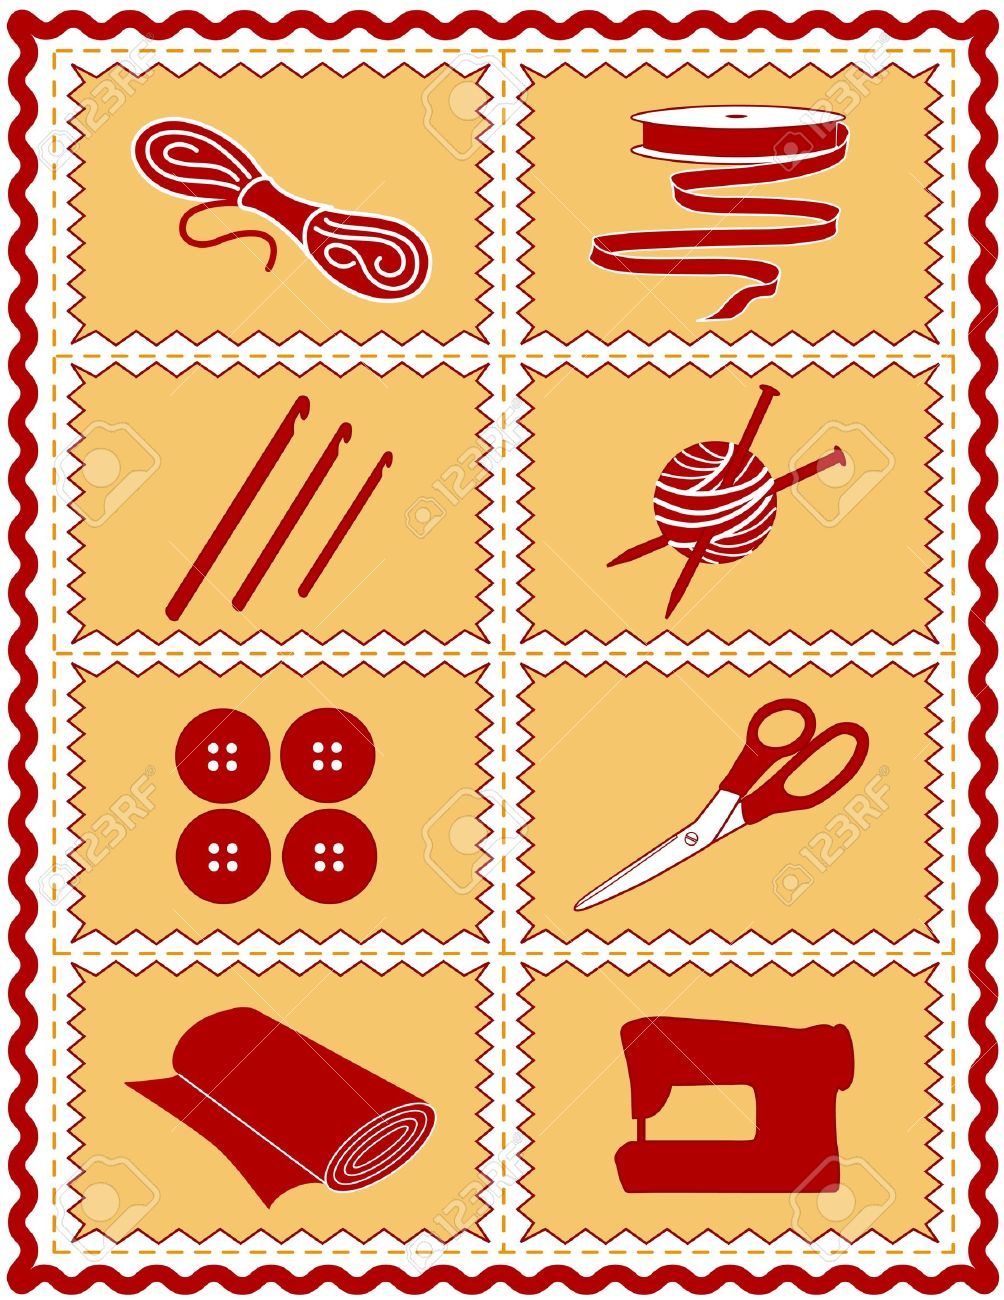 Costura, Punto De Ganchillo, Manualidades Iconos. Herramientas E ...